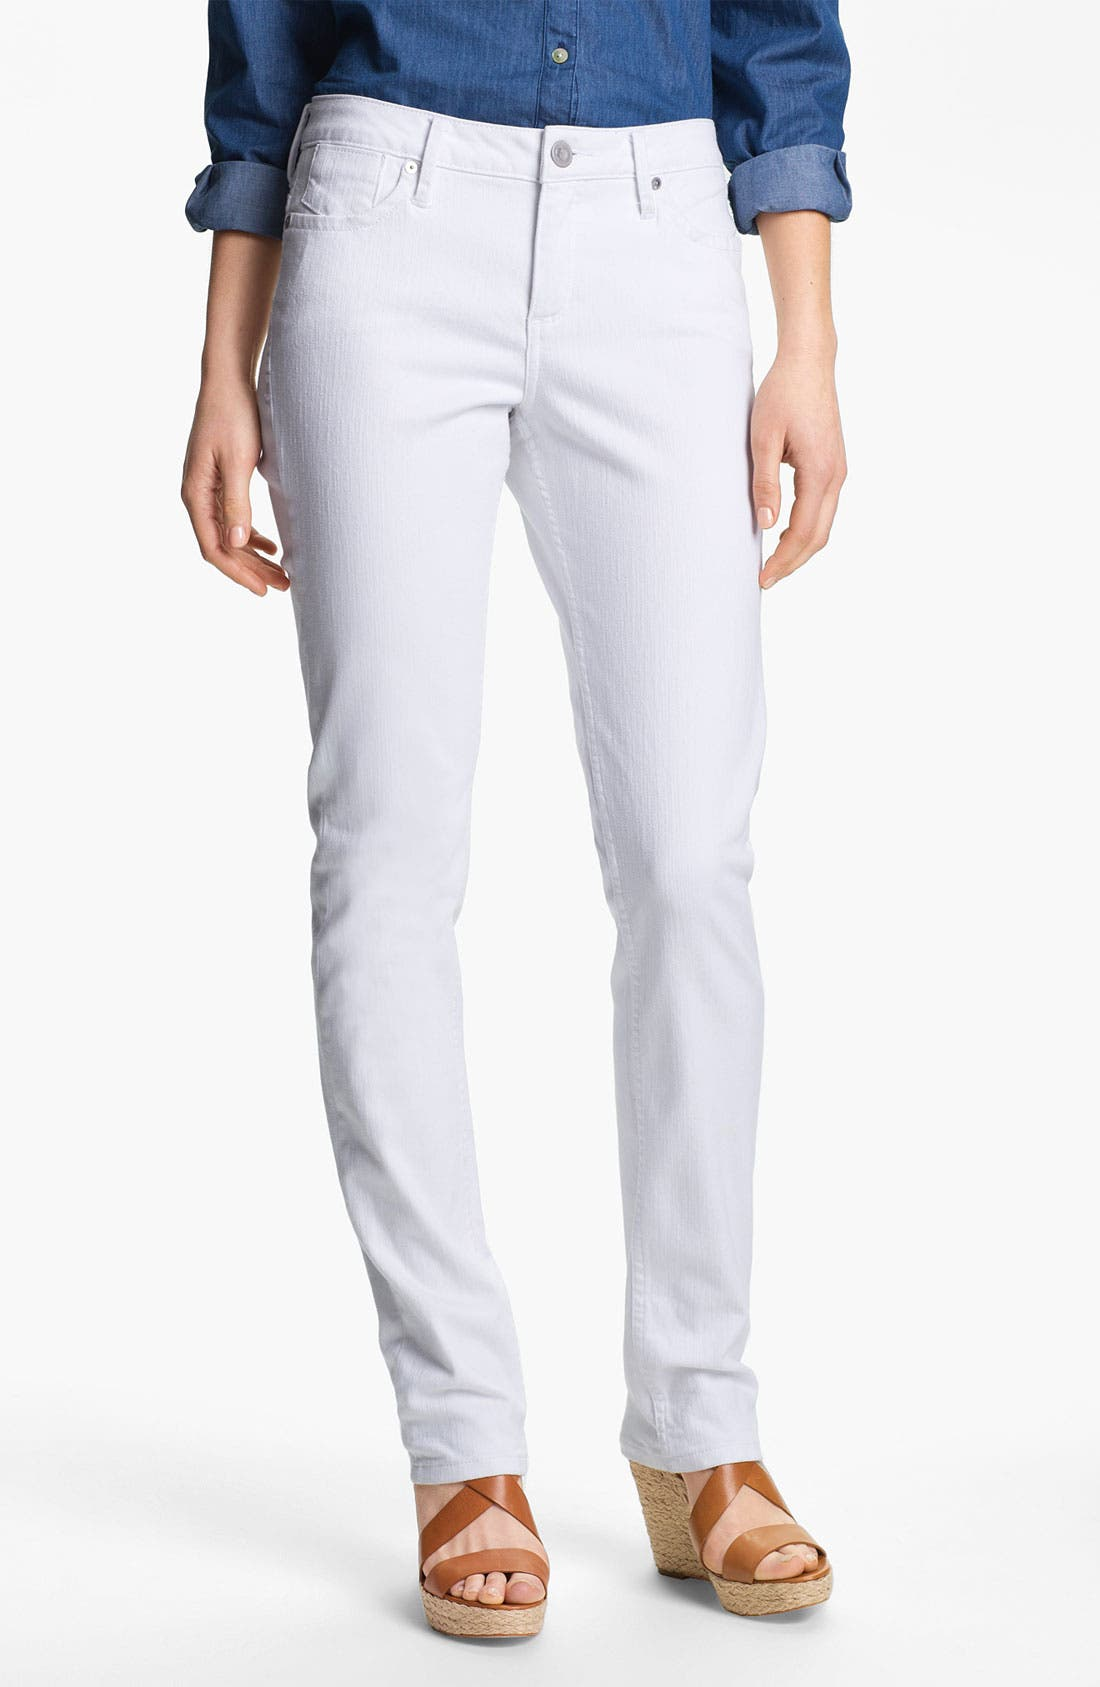 Alternate Image 1 Selected - Christopher Blue 'Sophia - Silverton' Skinny Jeans